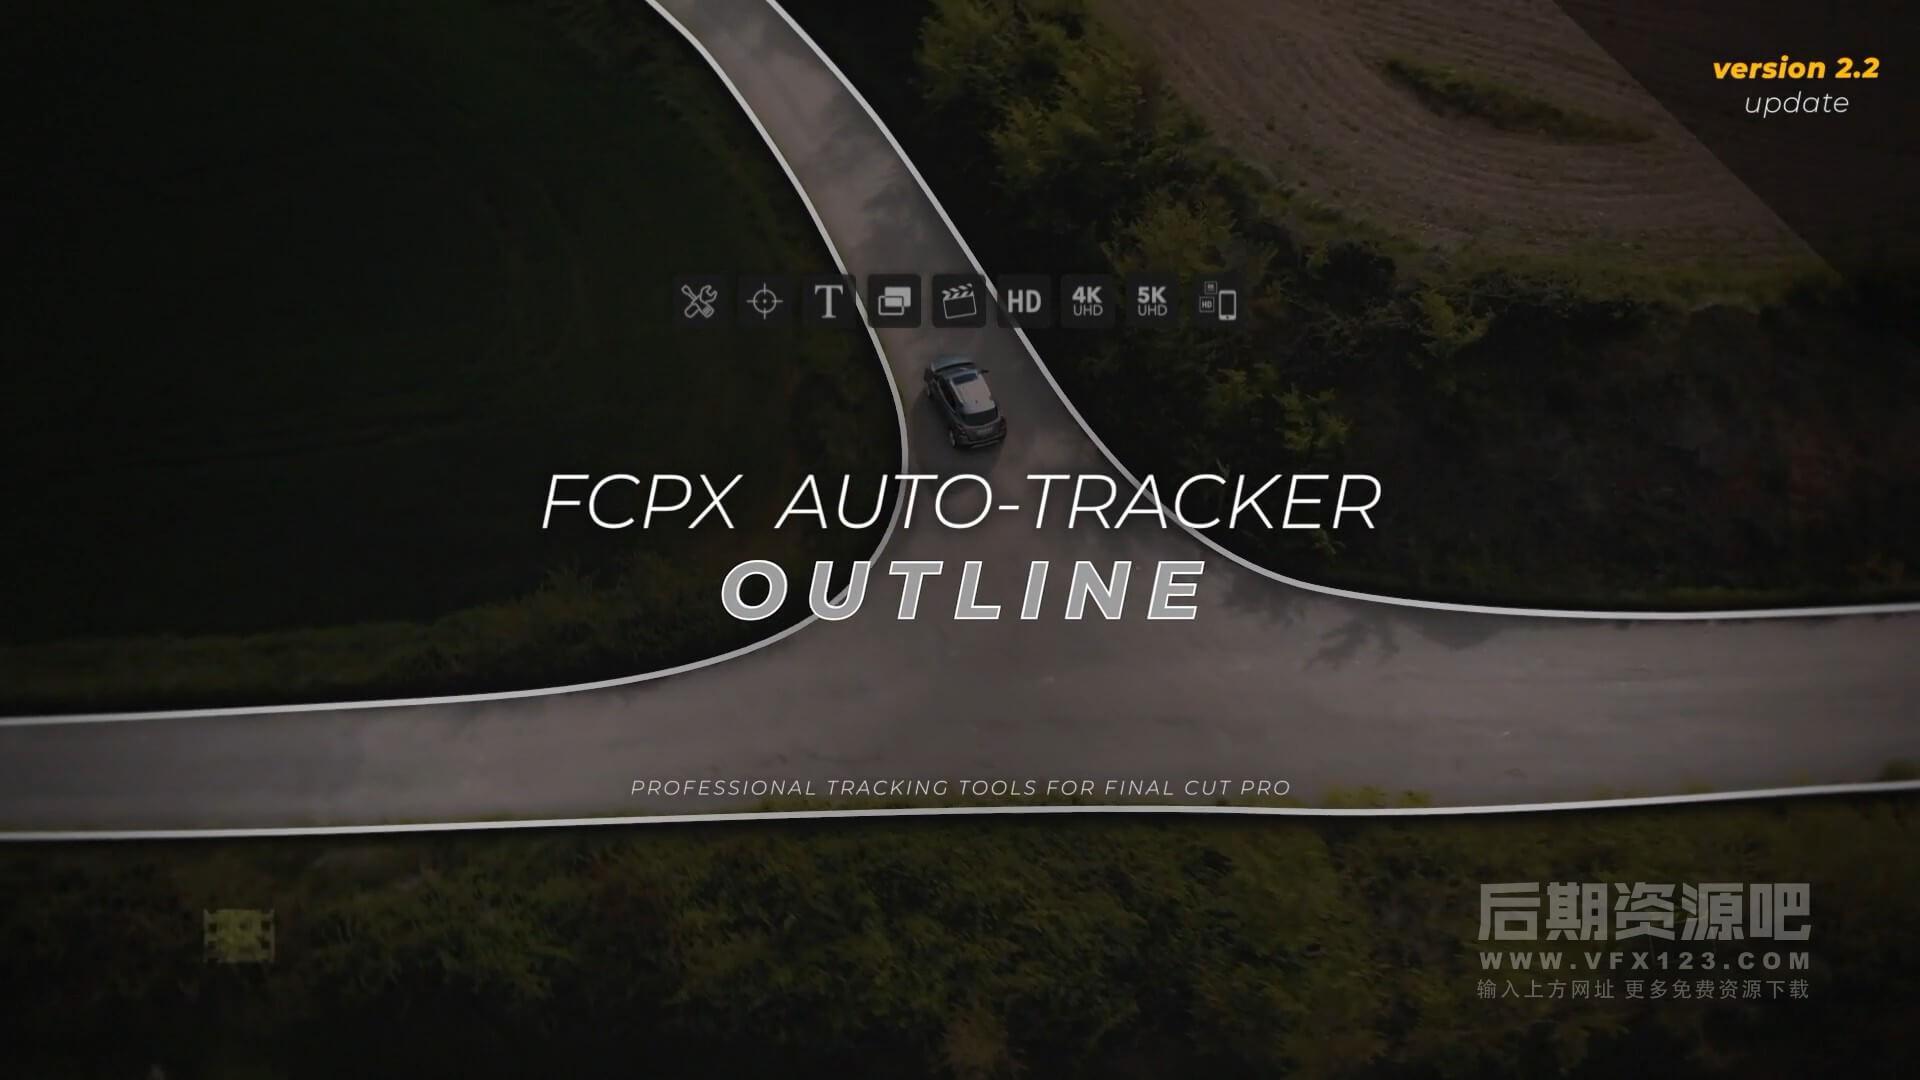 fcpx插件 自动跟踪轮廓描边标注划重点高亮显示工具 FCPX Auto Tracker Outline